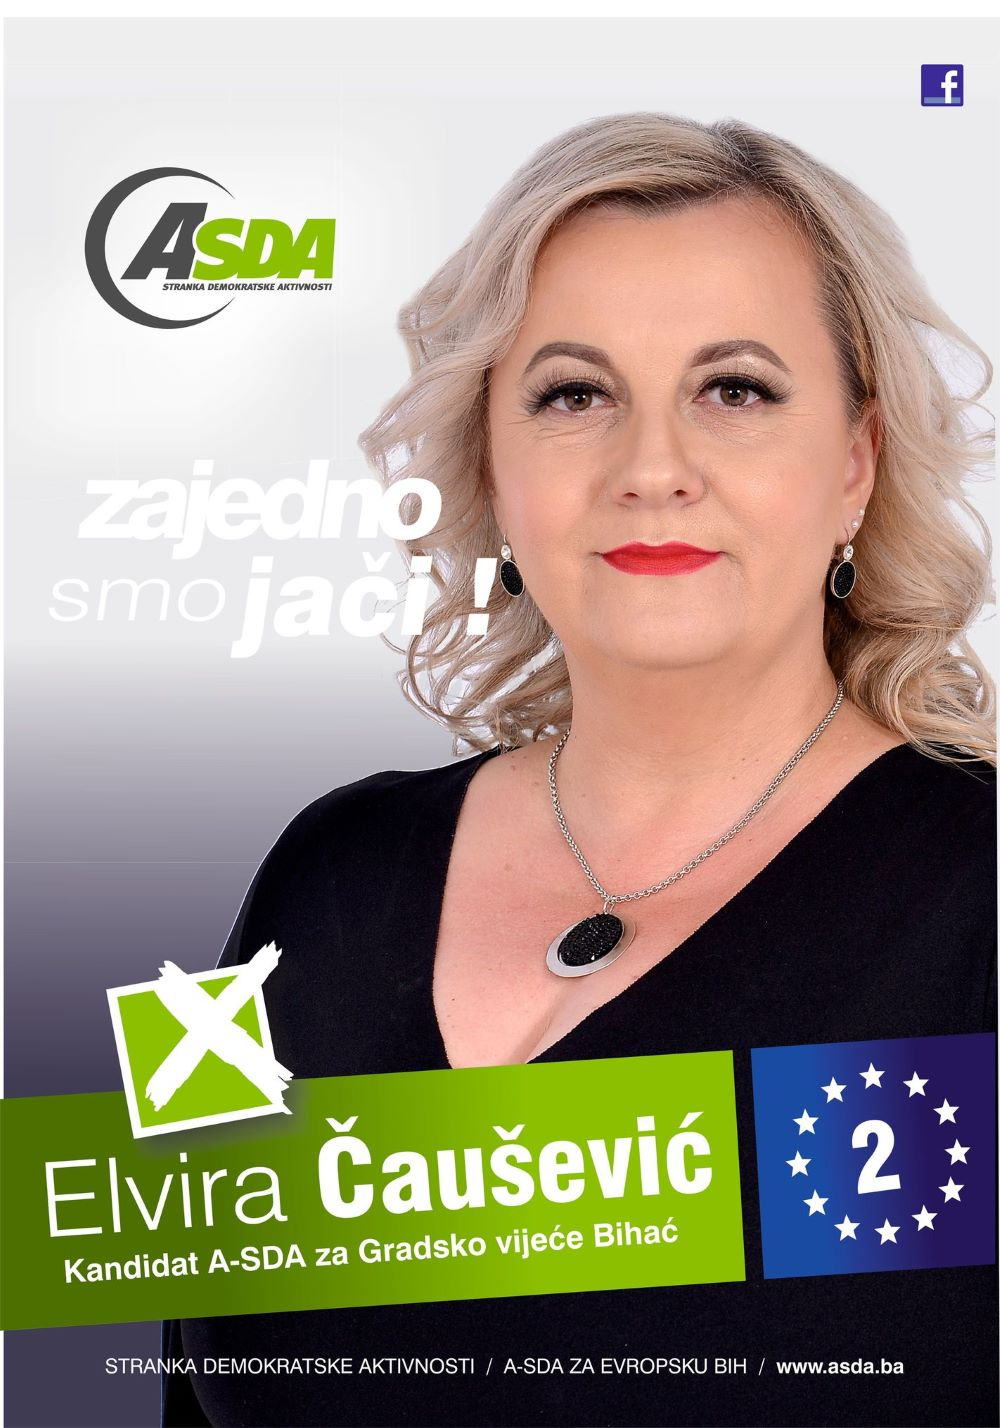 Elvira Čaušević